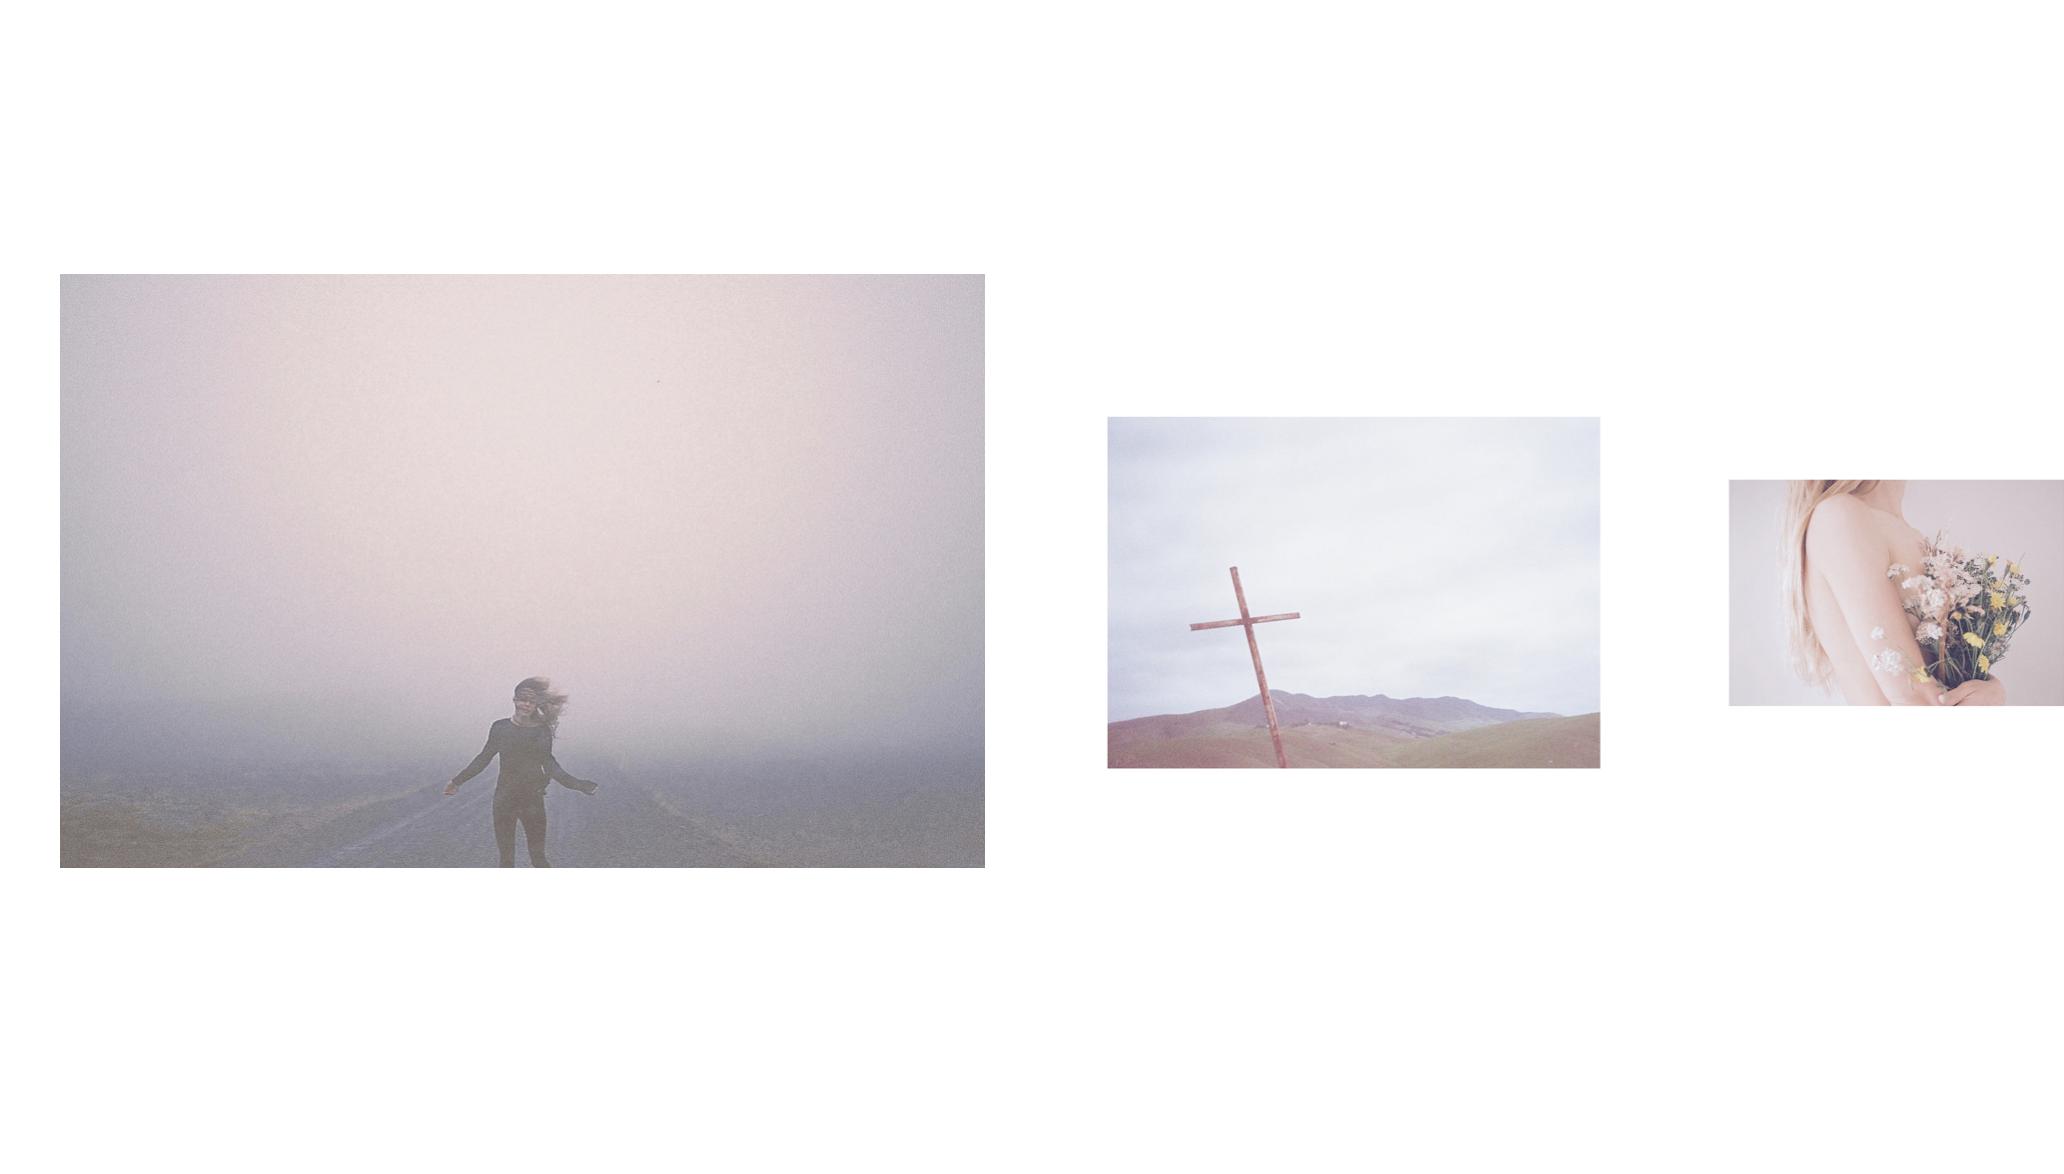 Screen+Shot+2019-09-16+at+2.32.06+PM.jpg